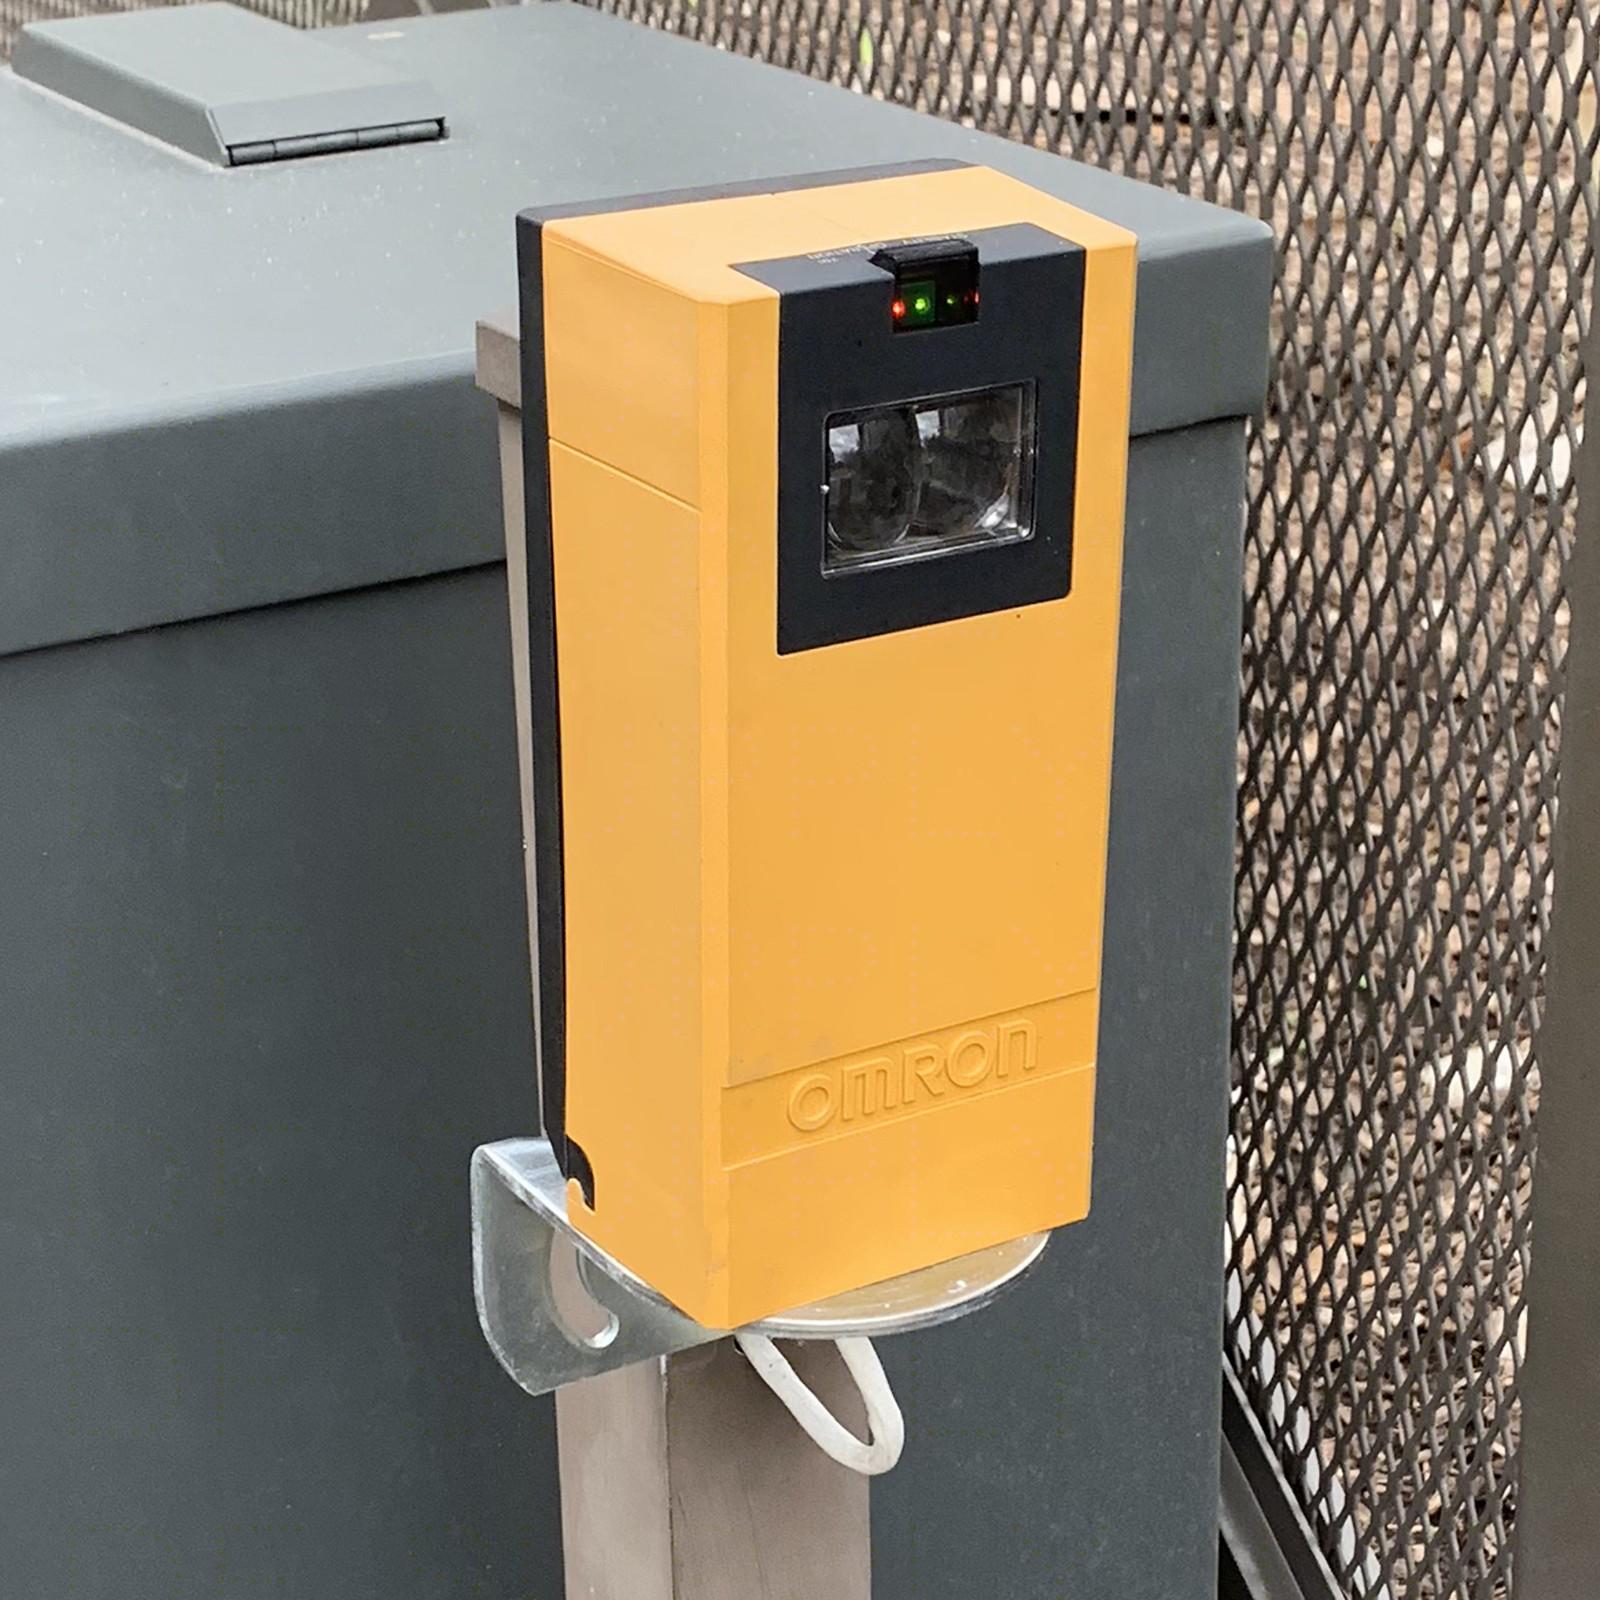 Omron E3k R10k4 Nr Photocell Sensor Photo Safety Eye E3k Gate